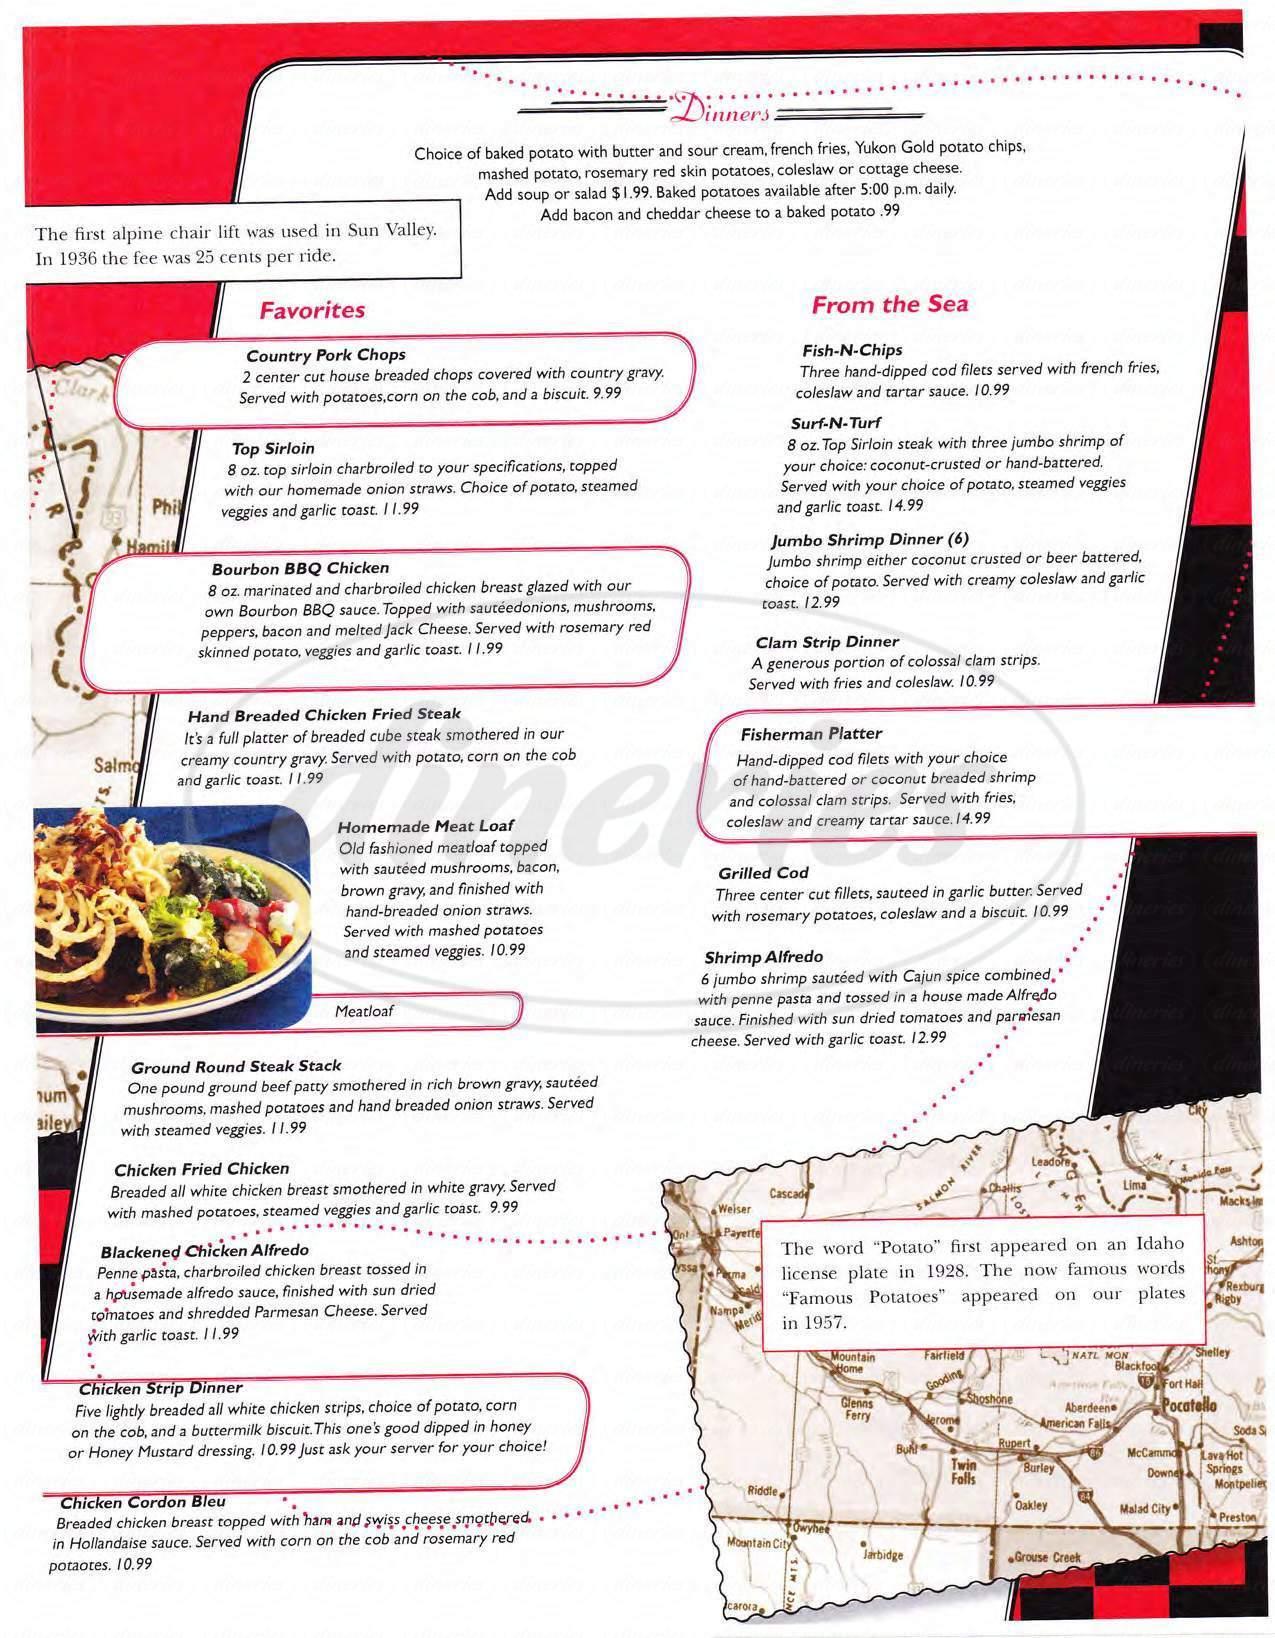 menu for Dixie's Diner